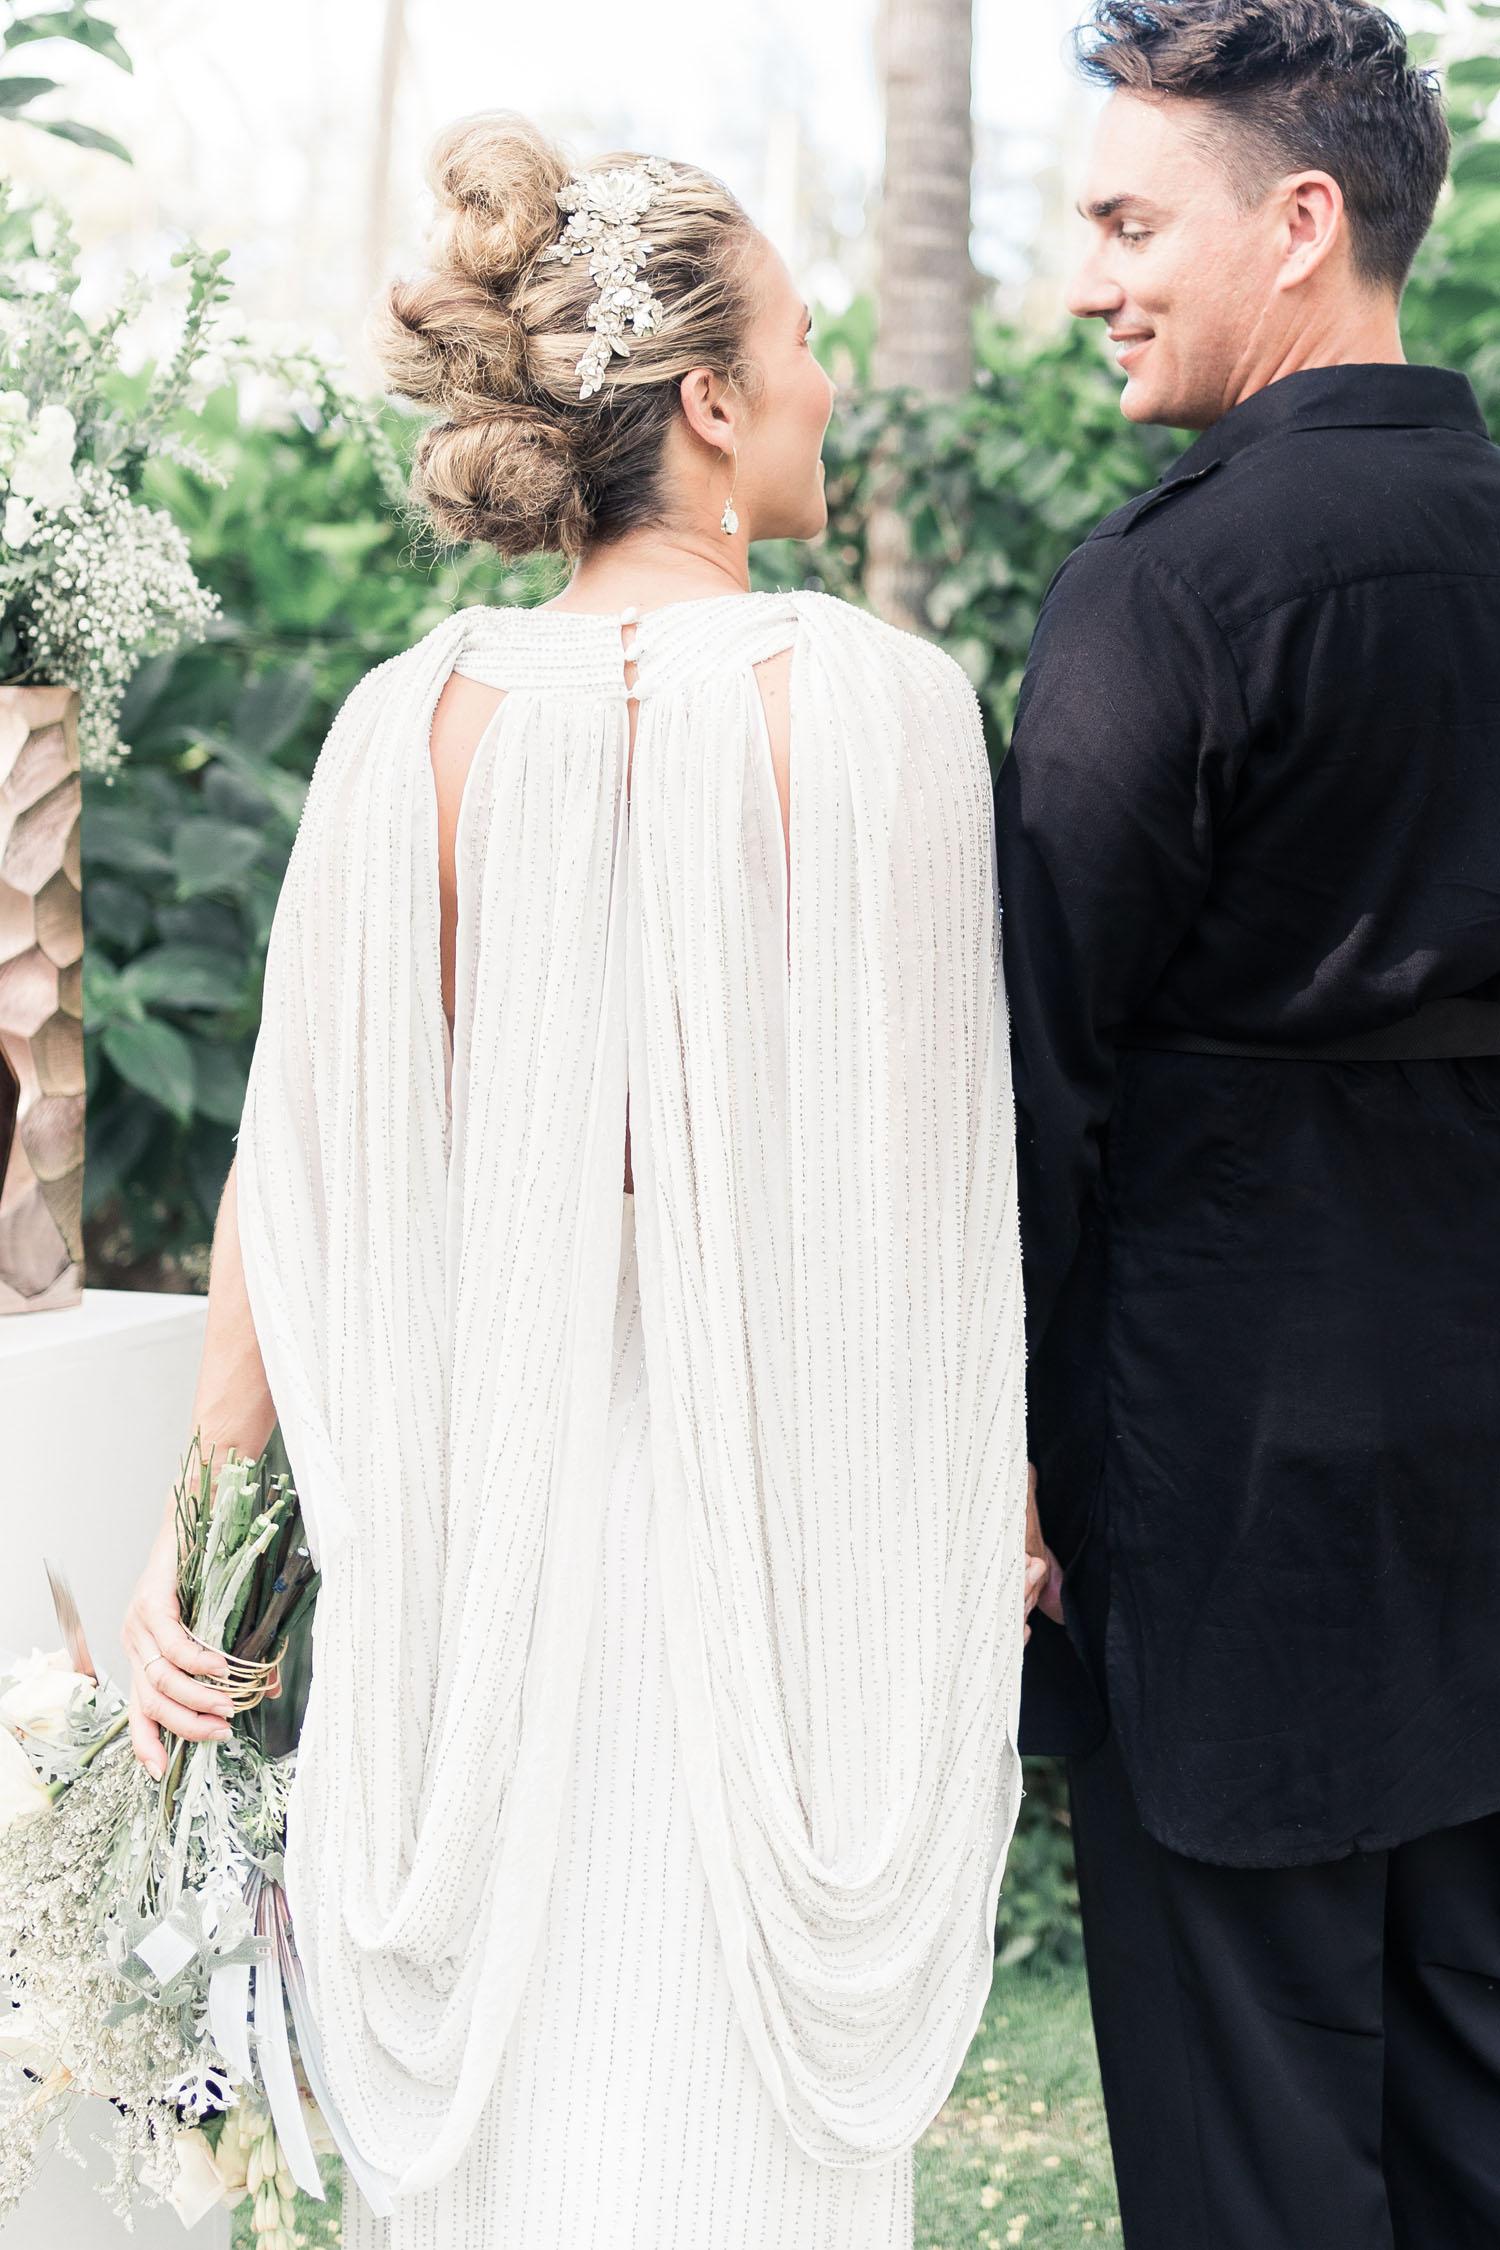 Star Wars wedding dress with cape